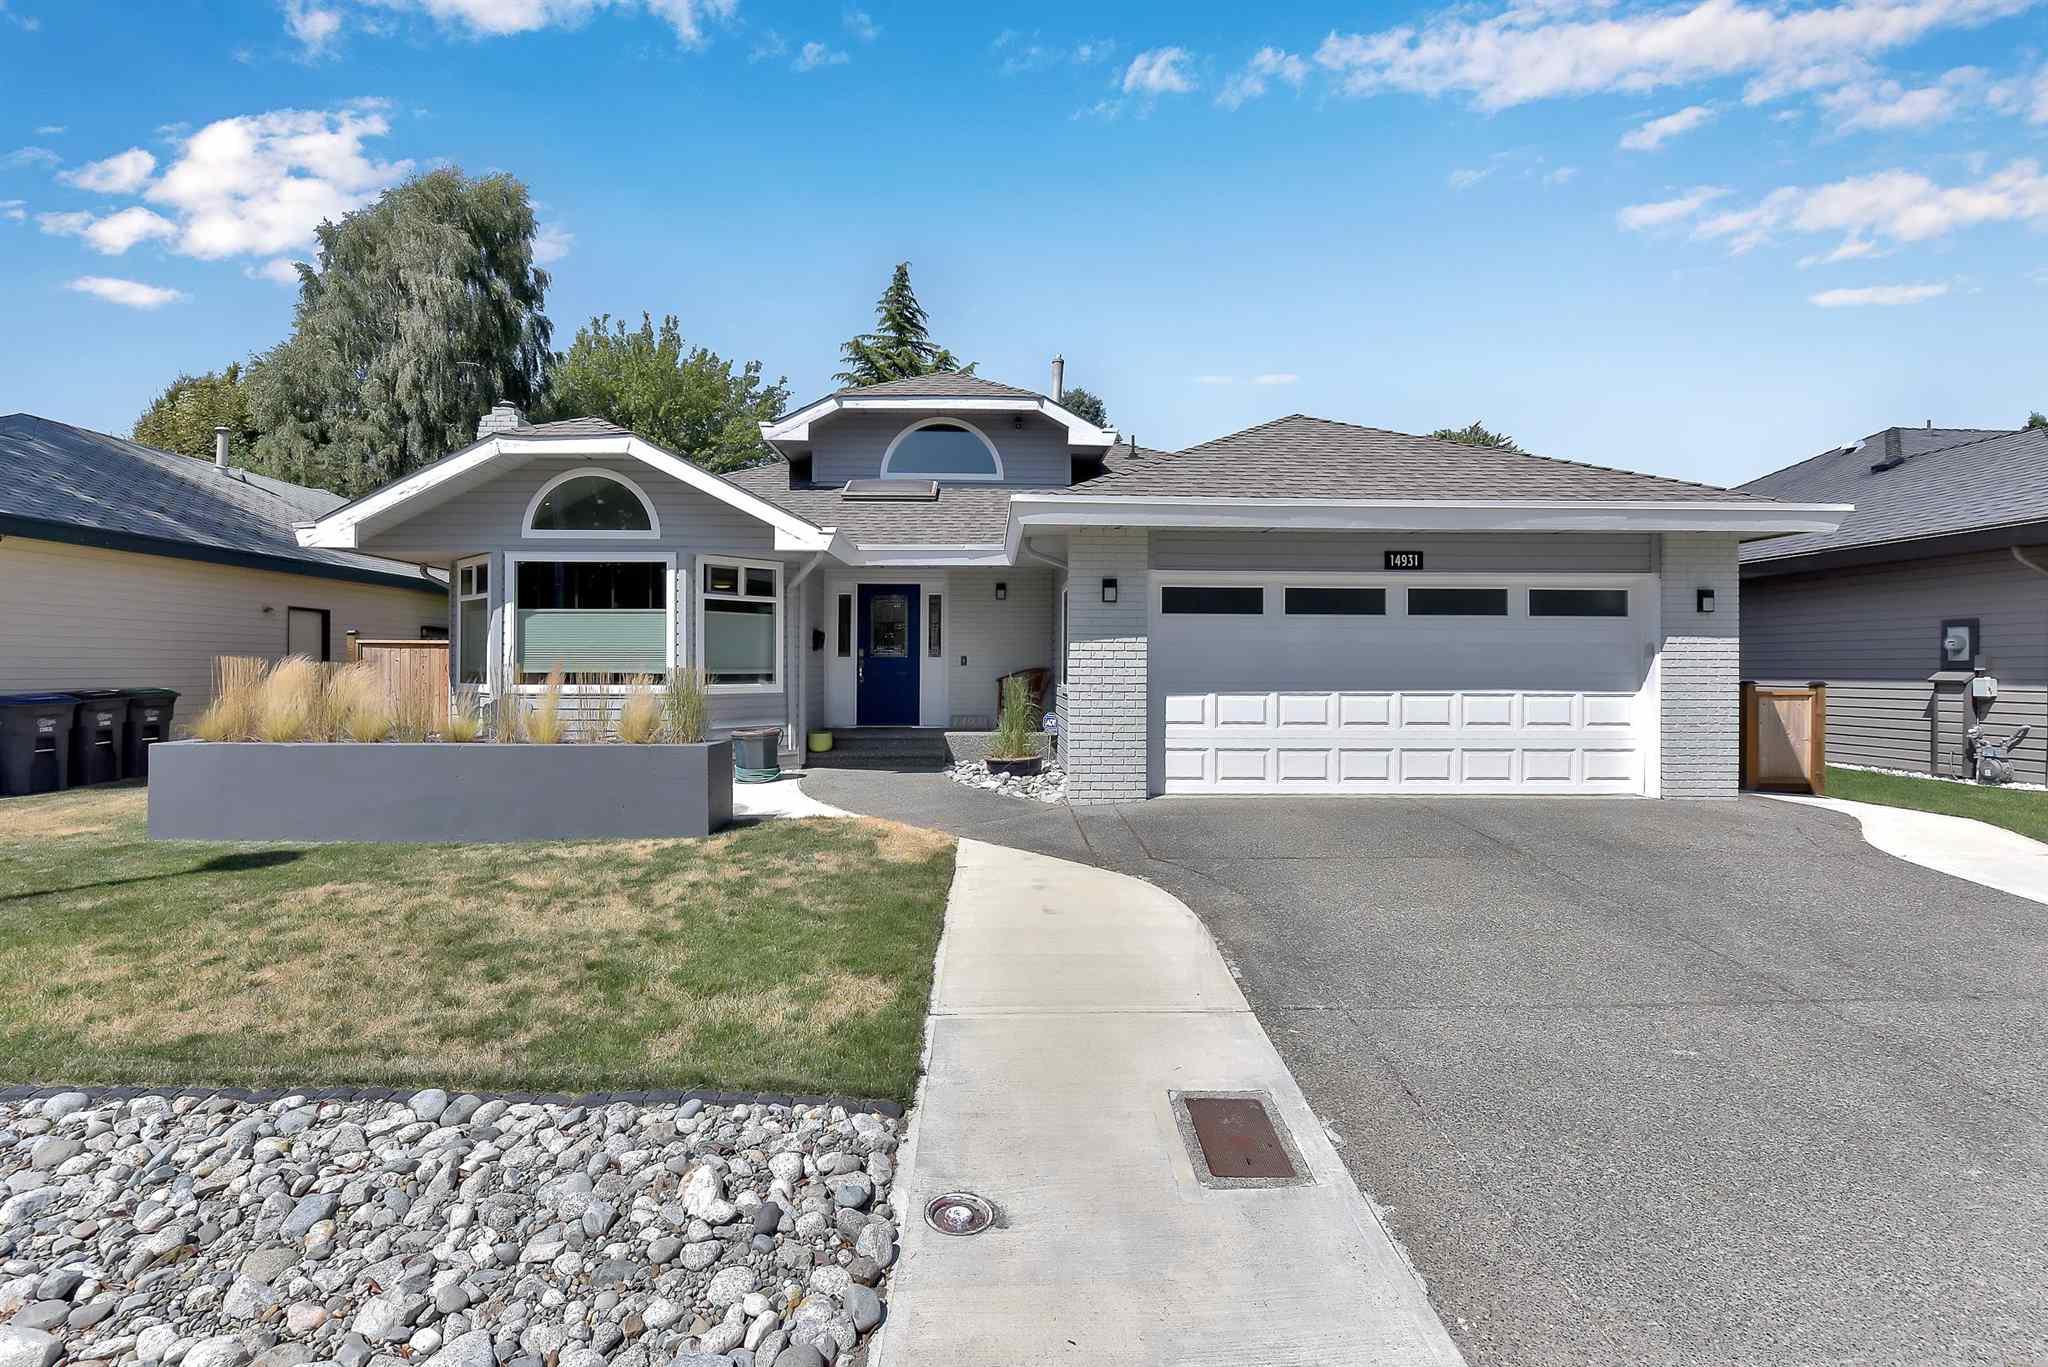 14931 20 AVENUE - Sunnyside Park Surrey House/Single Family for sale, 3 Bedrooms (R2604087)